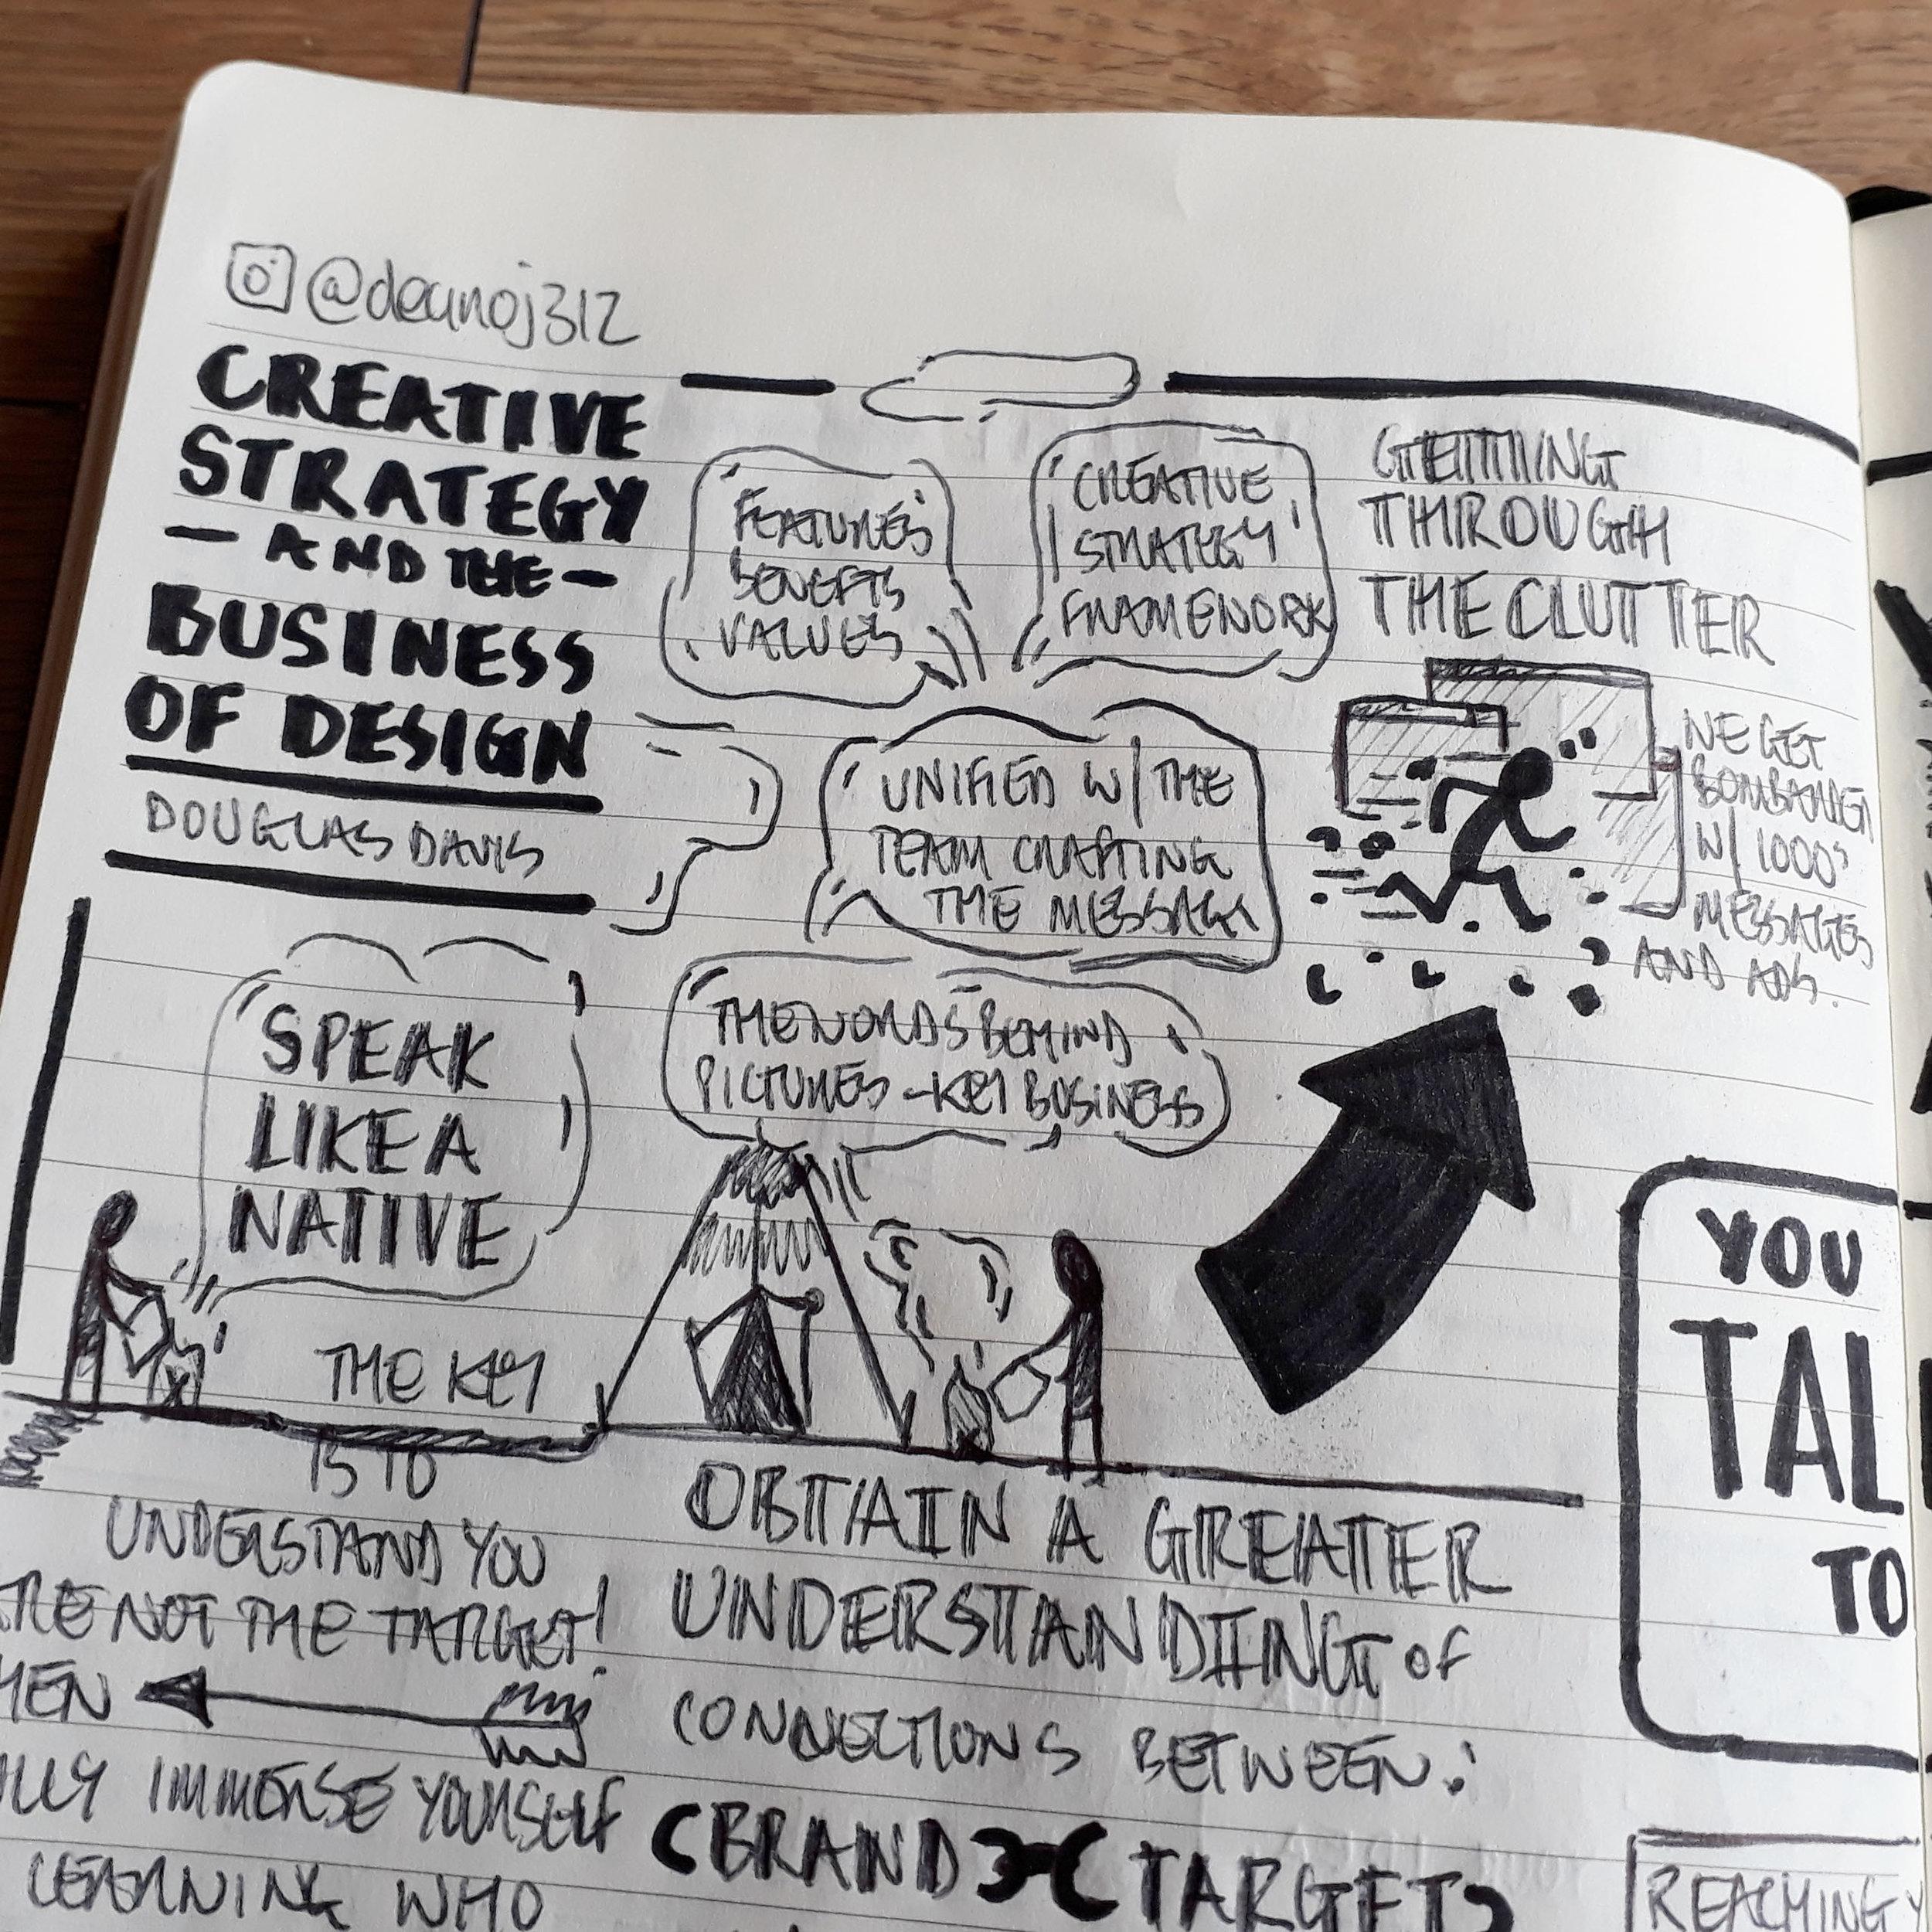 CreativeStrategyAndTheBusinessOfDesign_Part8.1.jpg